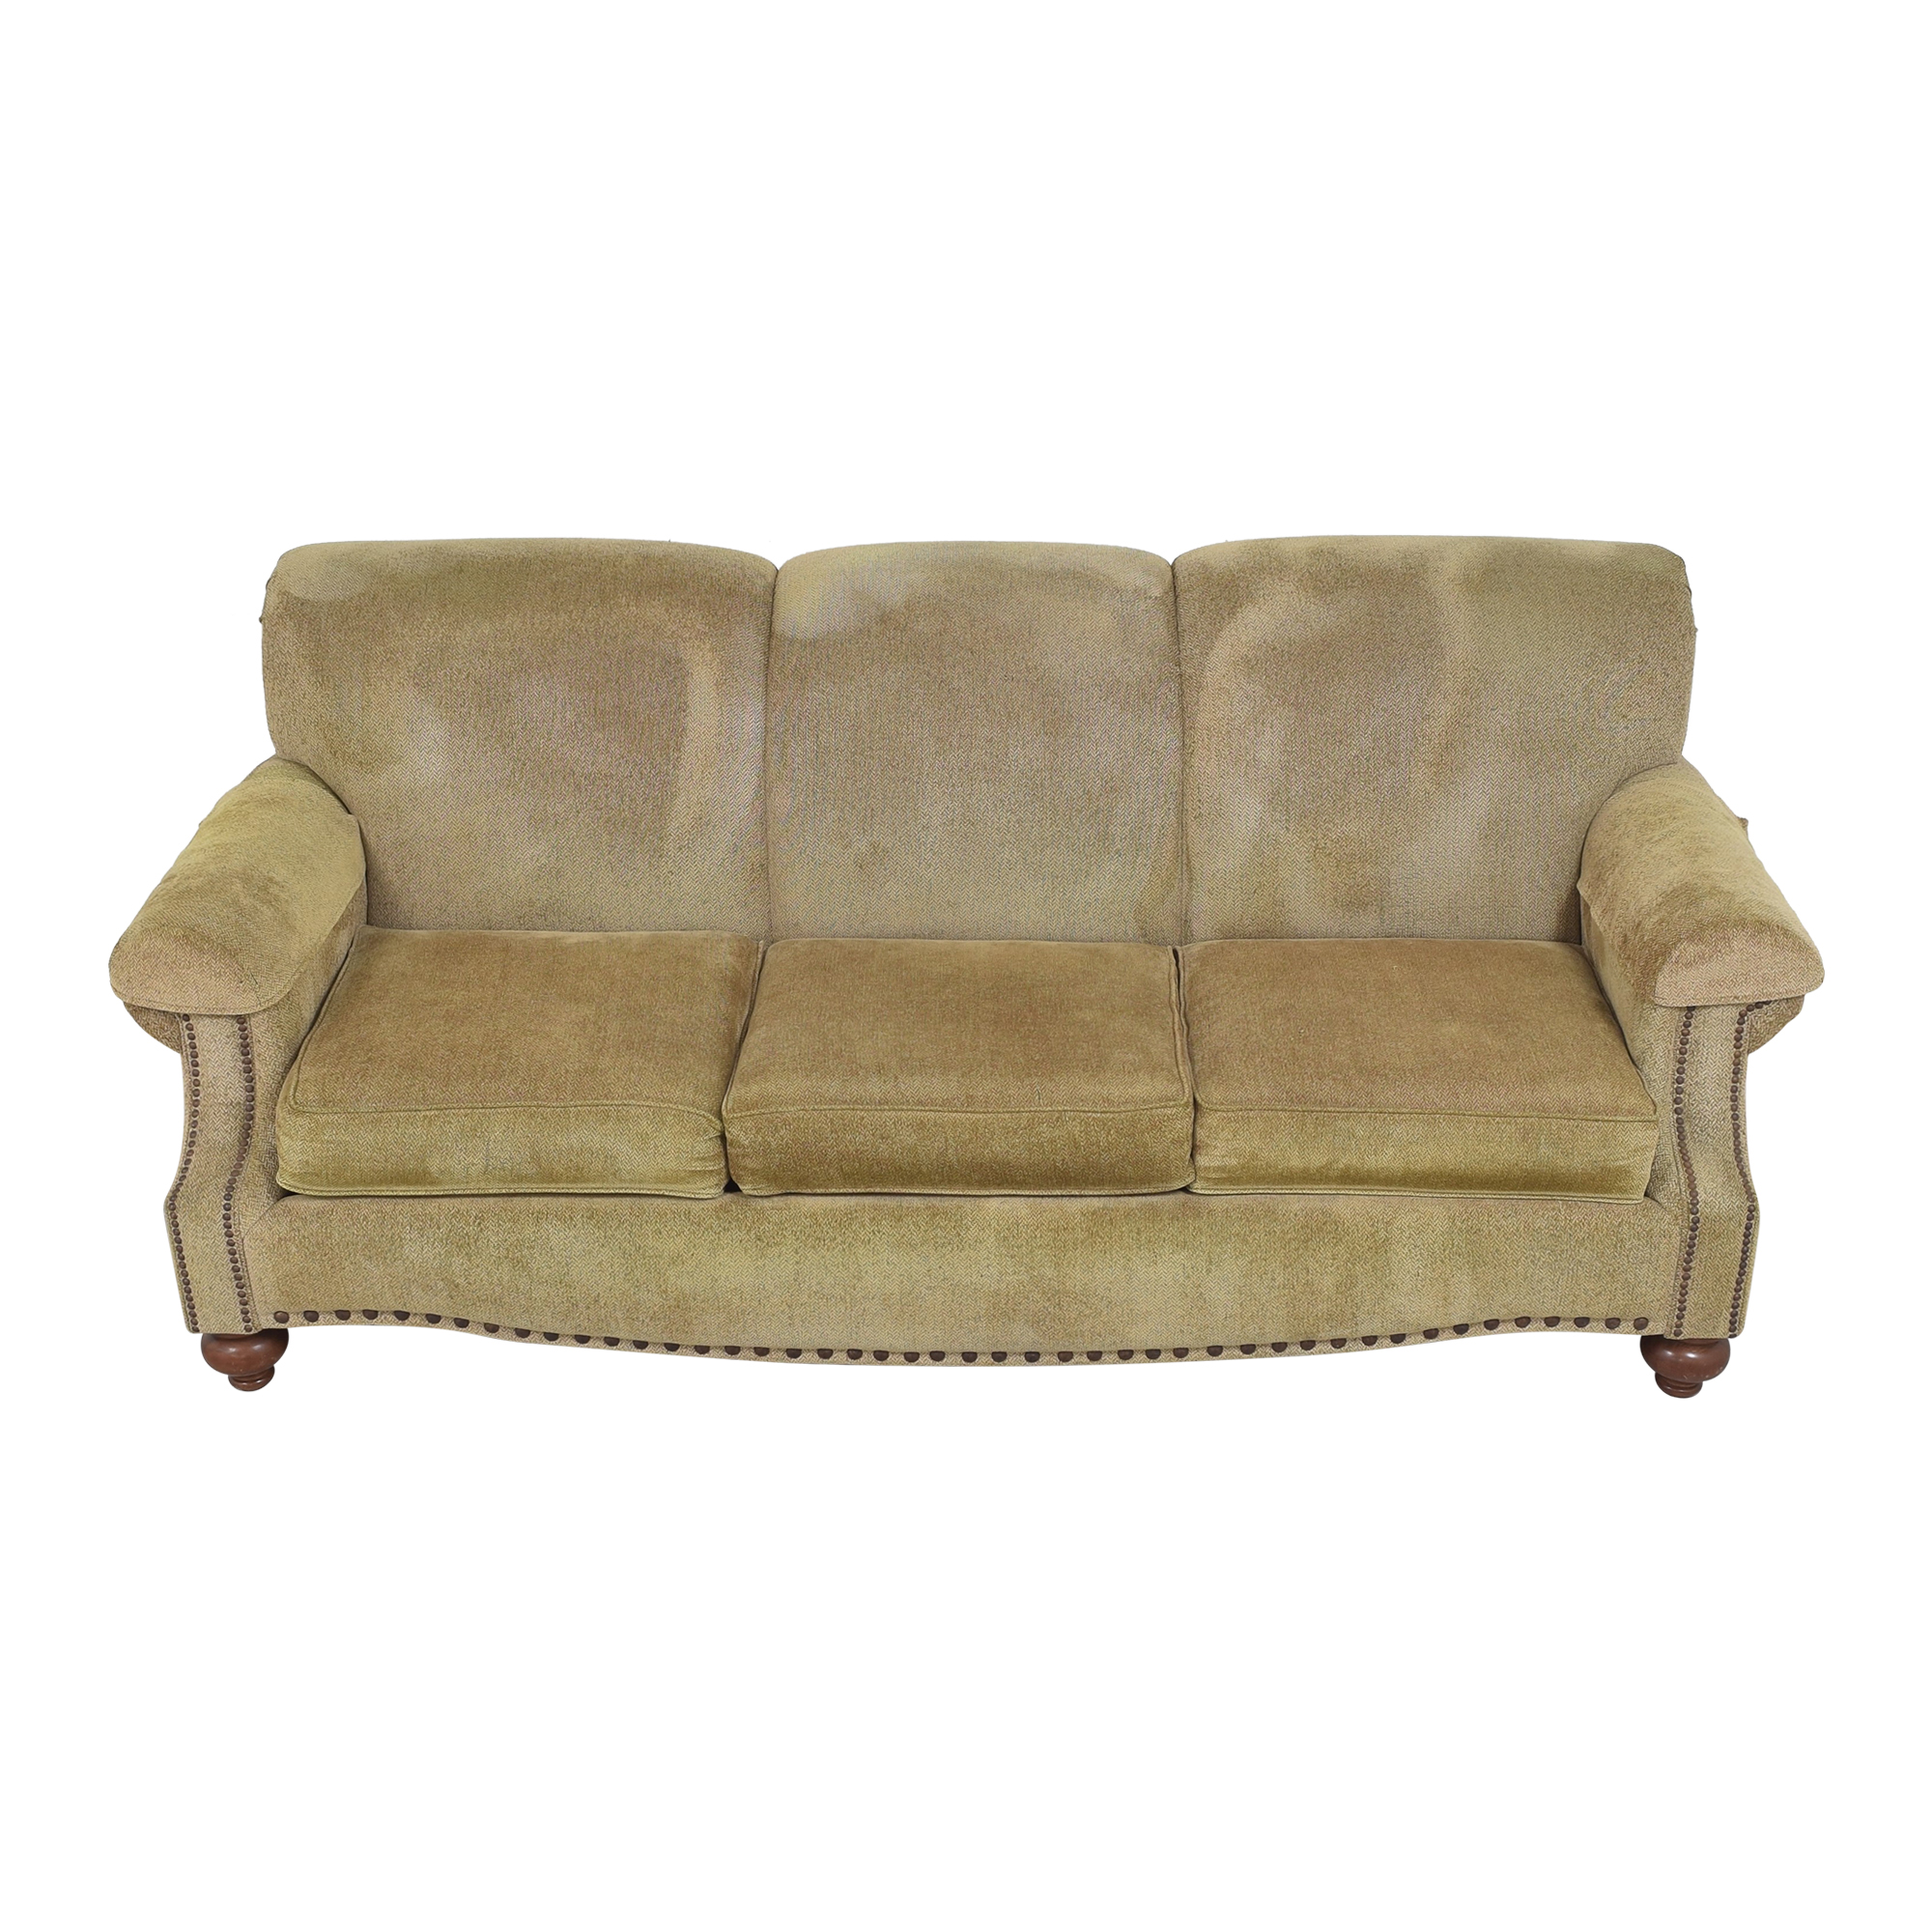 Bassett Furniture Bassett Furniture Three Cushion Nailhead Sofa on sale